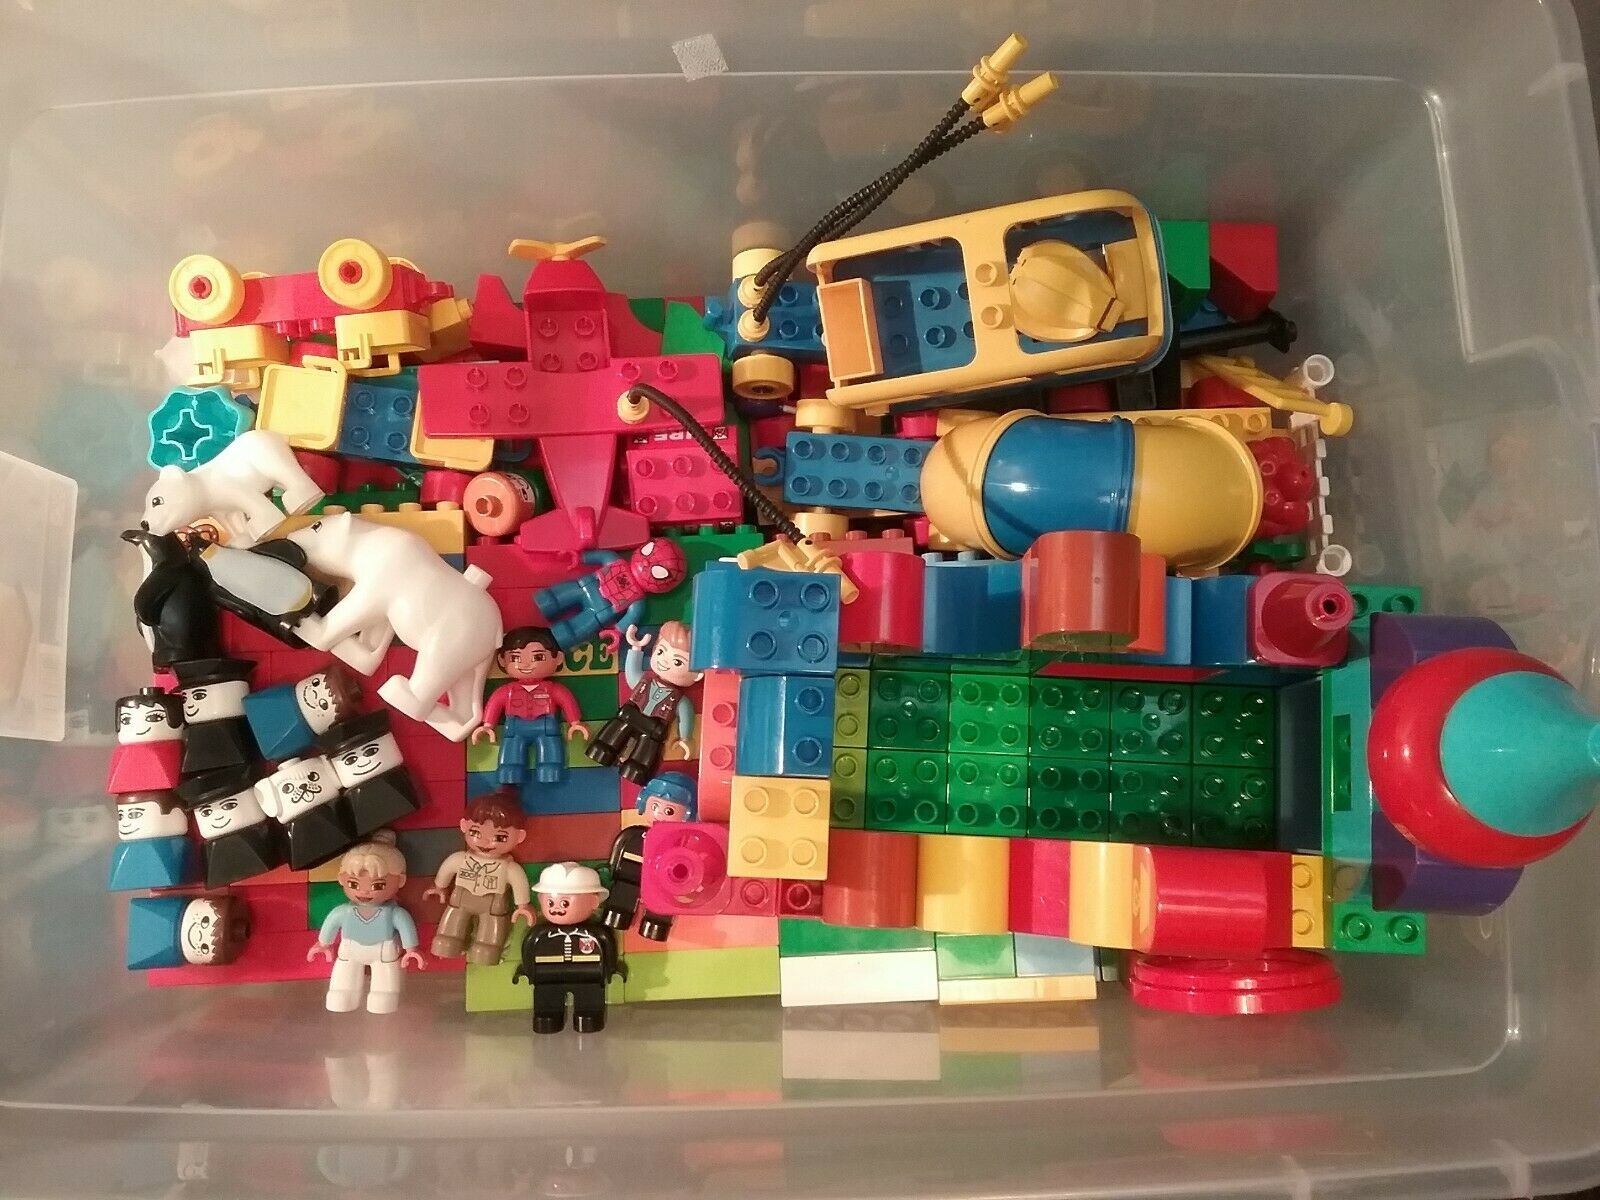 HUGE LOT LEGO DUPLO 450 + PCS 12 LBS FIGURES ANIMALS TRAILERS VEHICLES WINDOWS